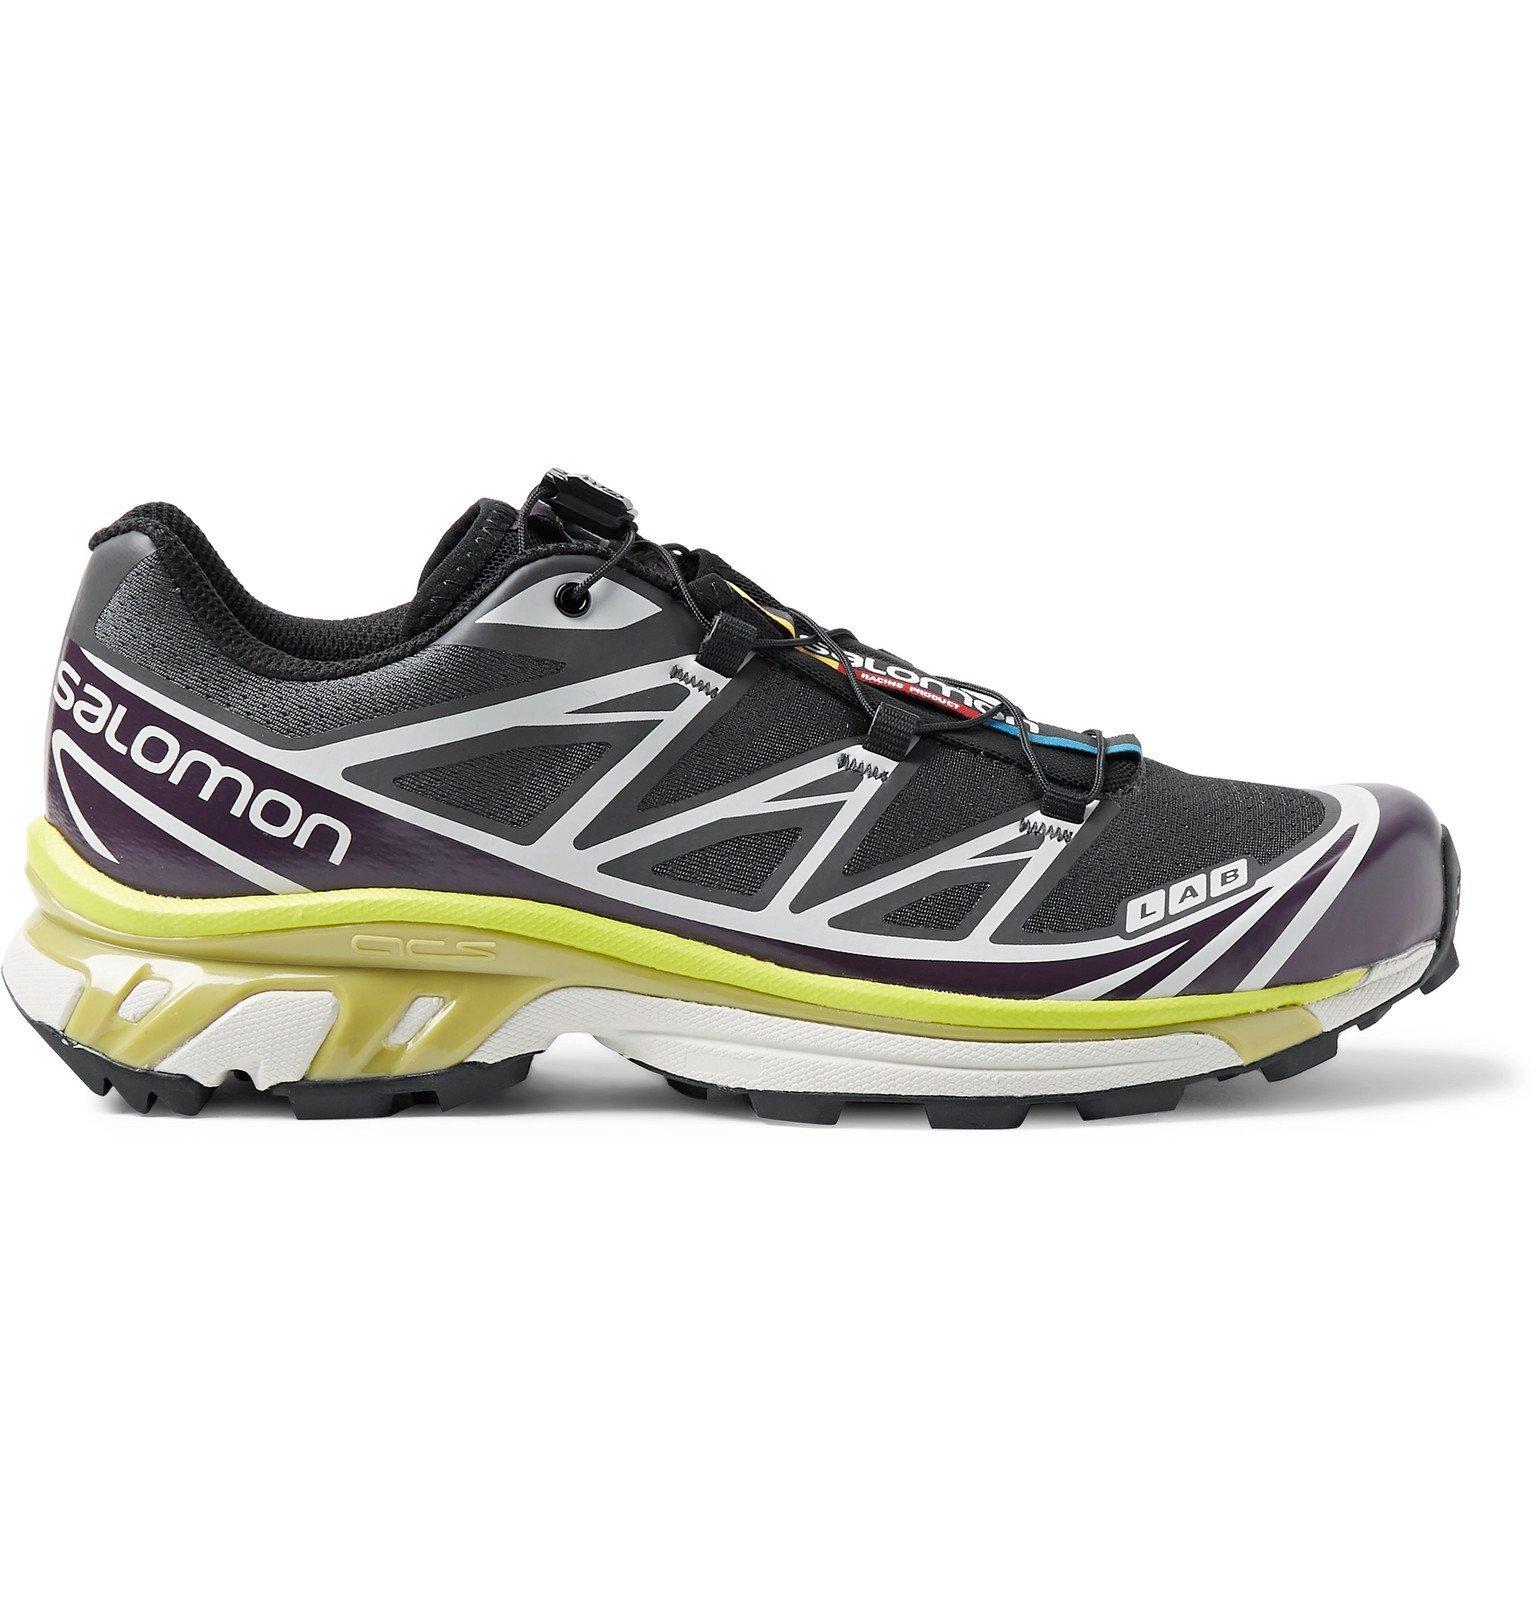 Photo: Salomon - XT-6 ADV Mesh and Rubber Running Sneakers - Gray